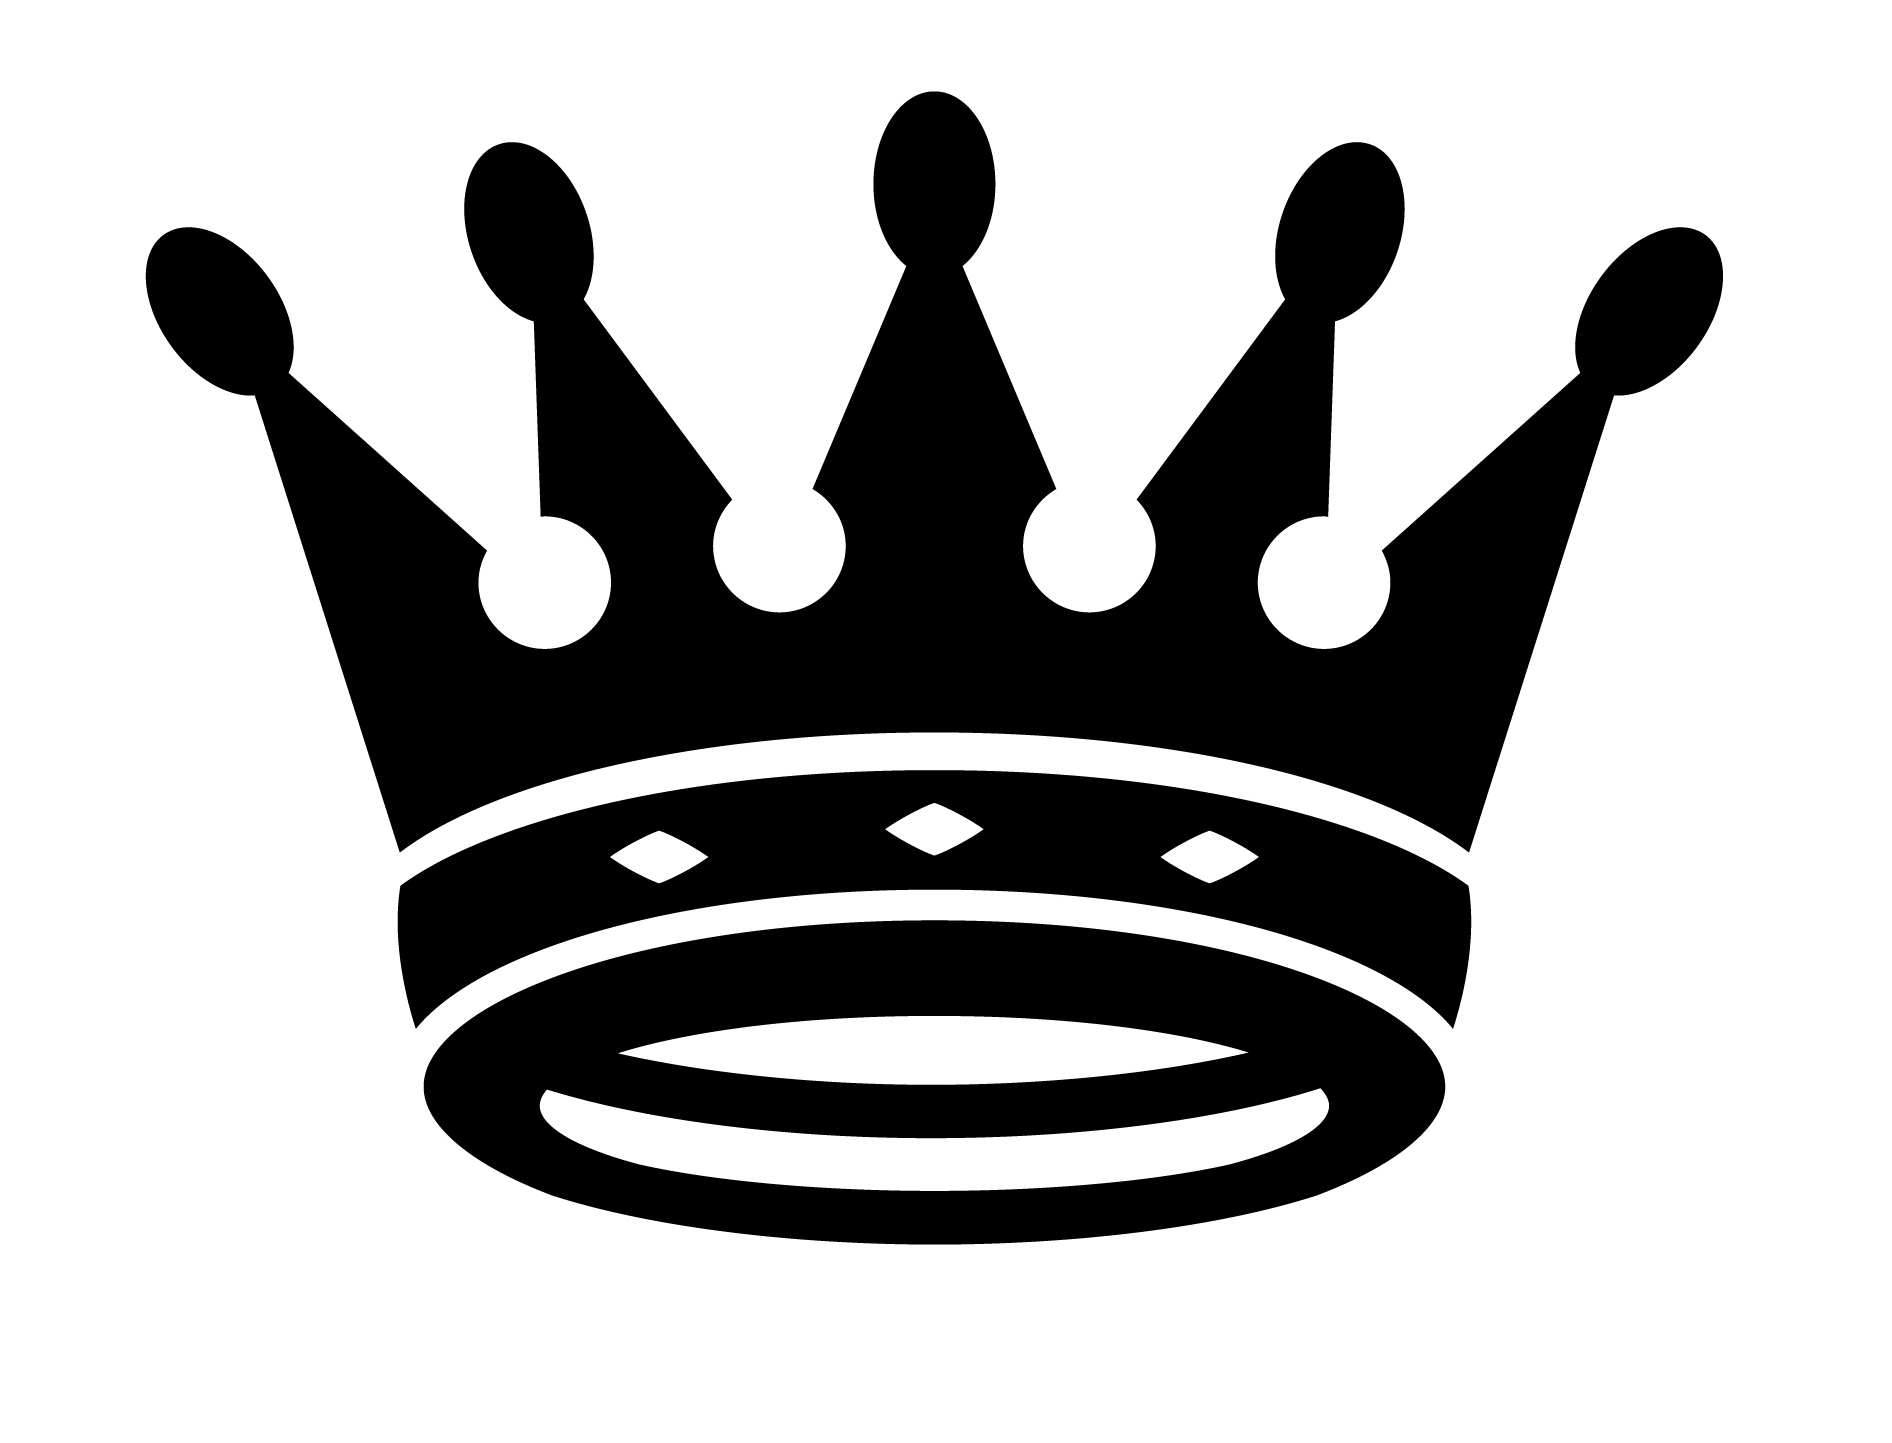 Crown king clip art vector free download Crown king clip art - ClipartFest vector free download